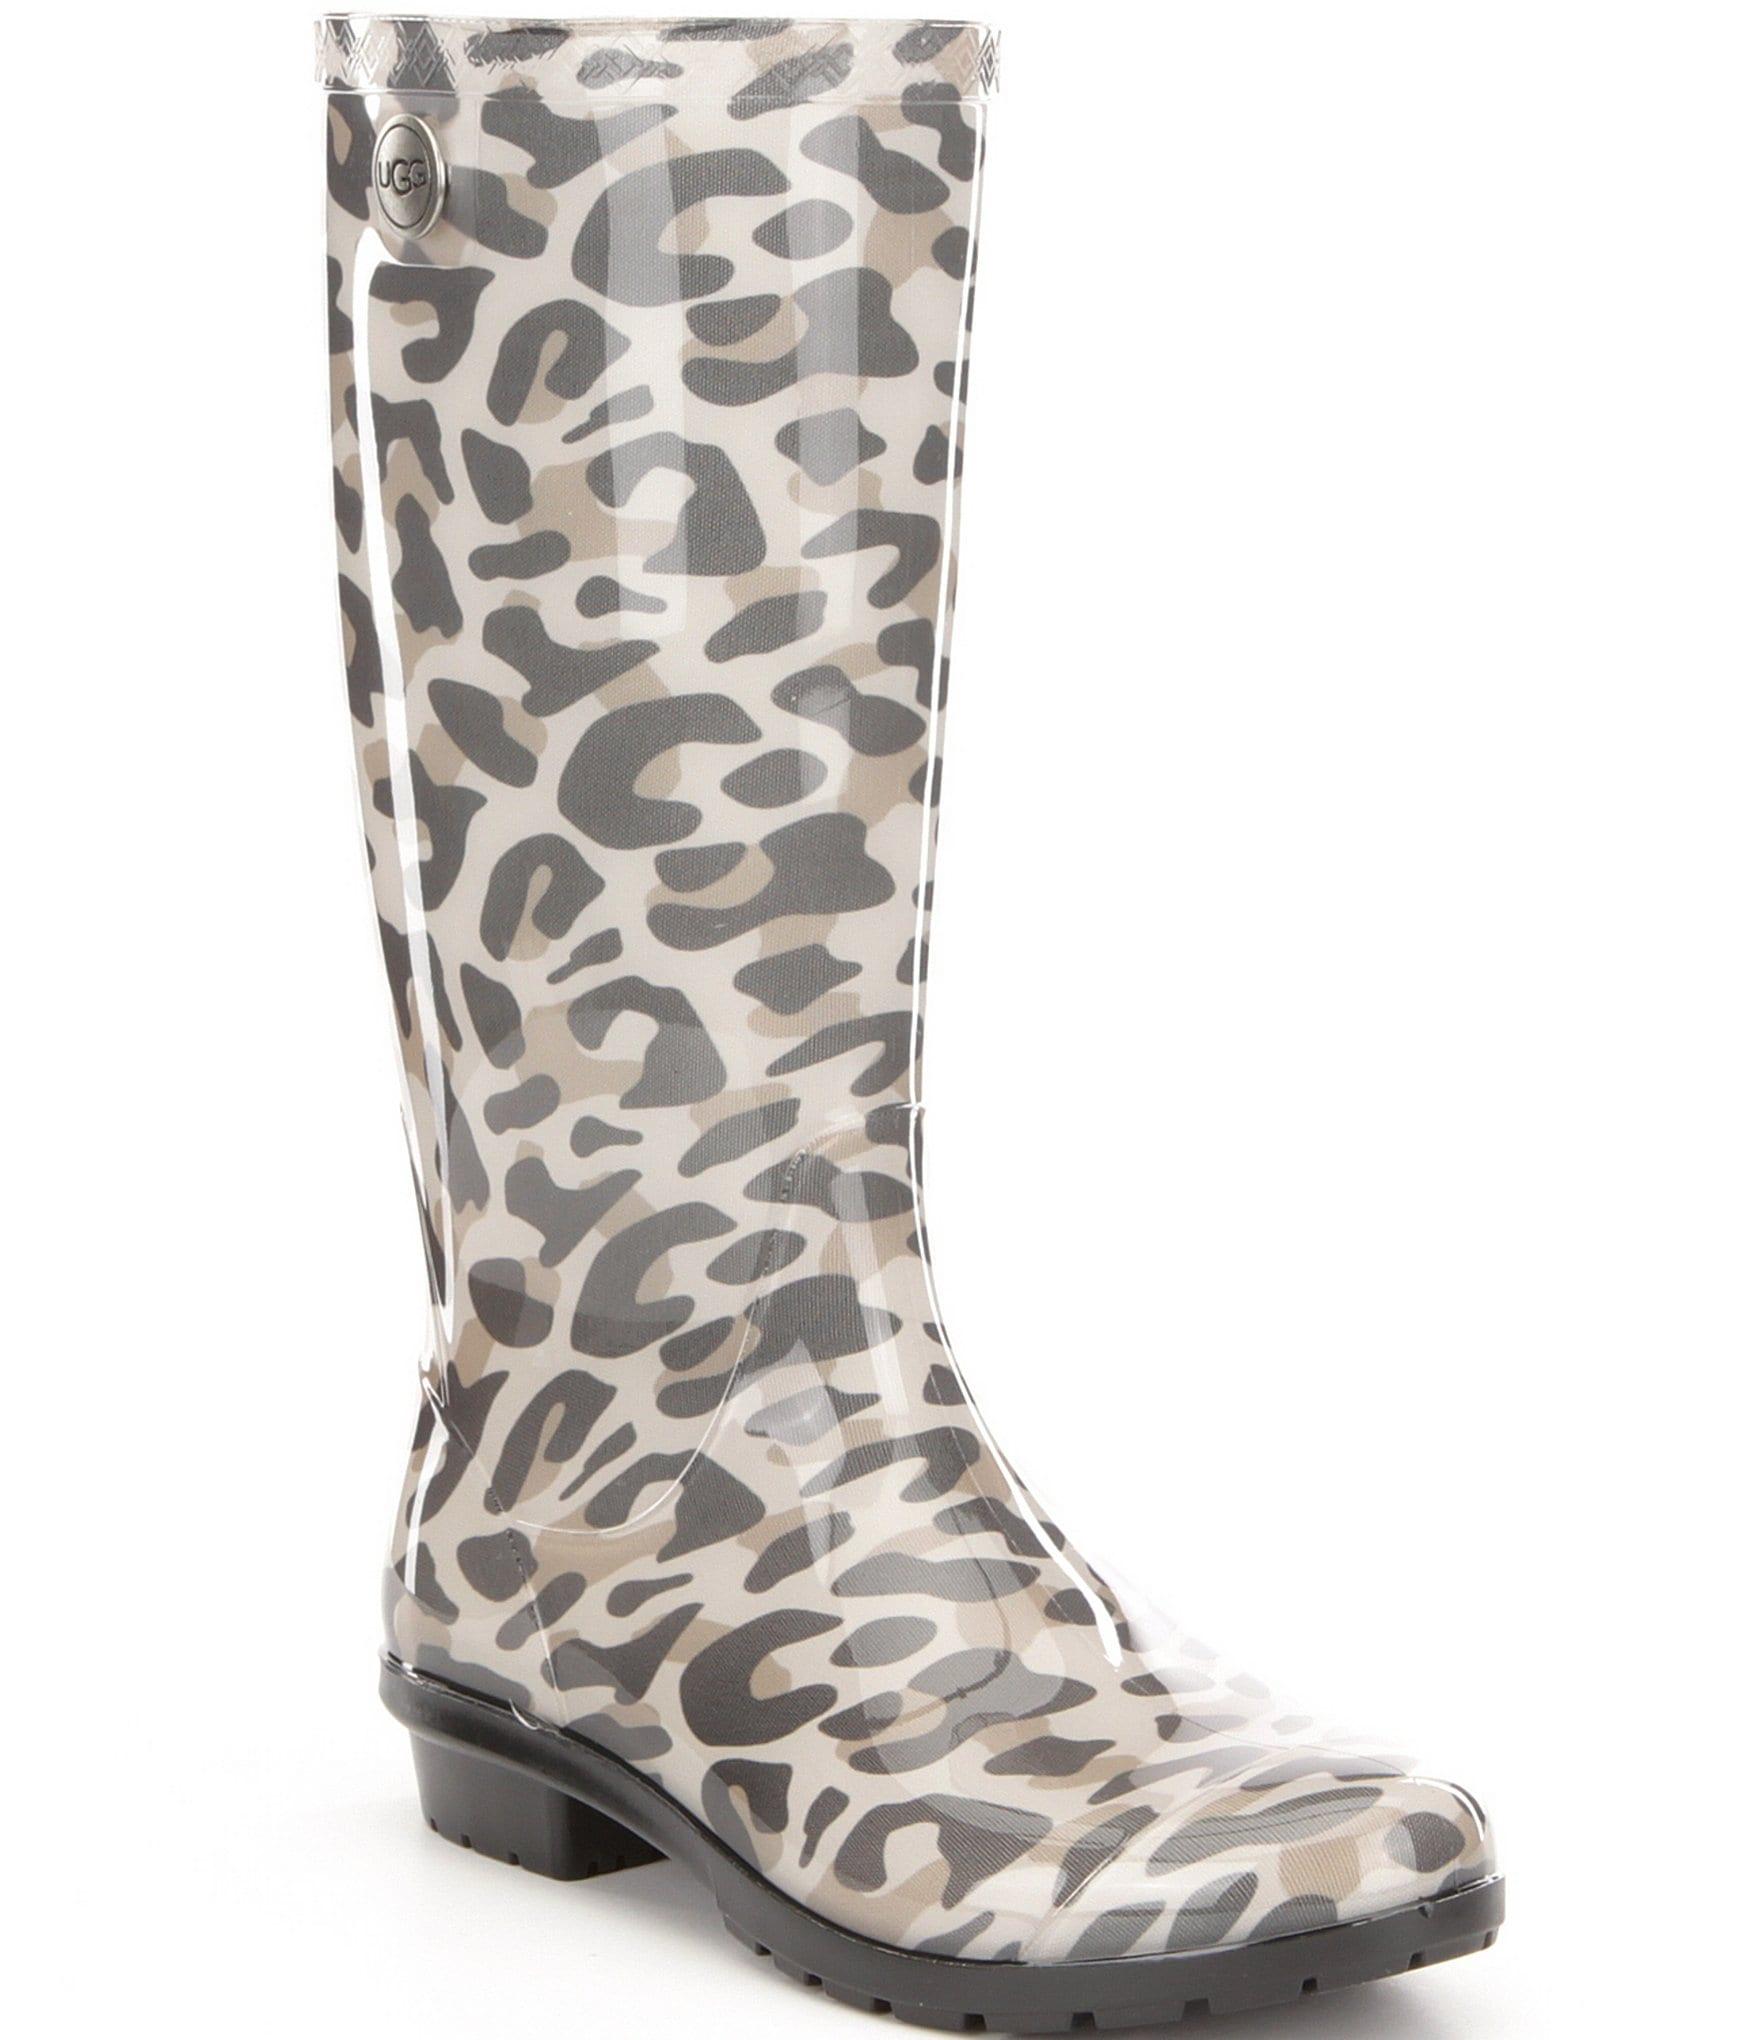 260fdc2e74c Black Ugg Shaye Rain Boots | MIT Hillel